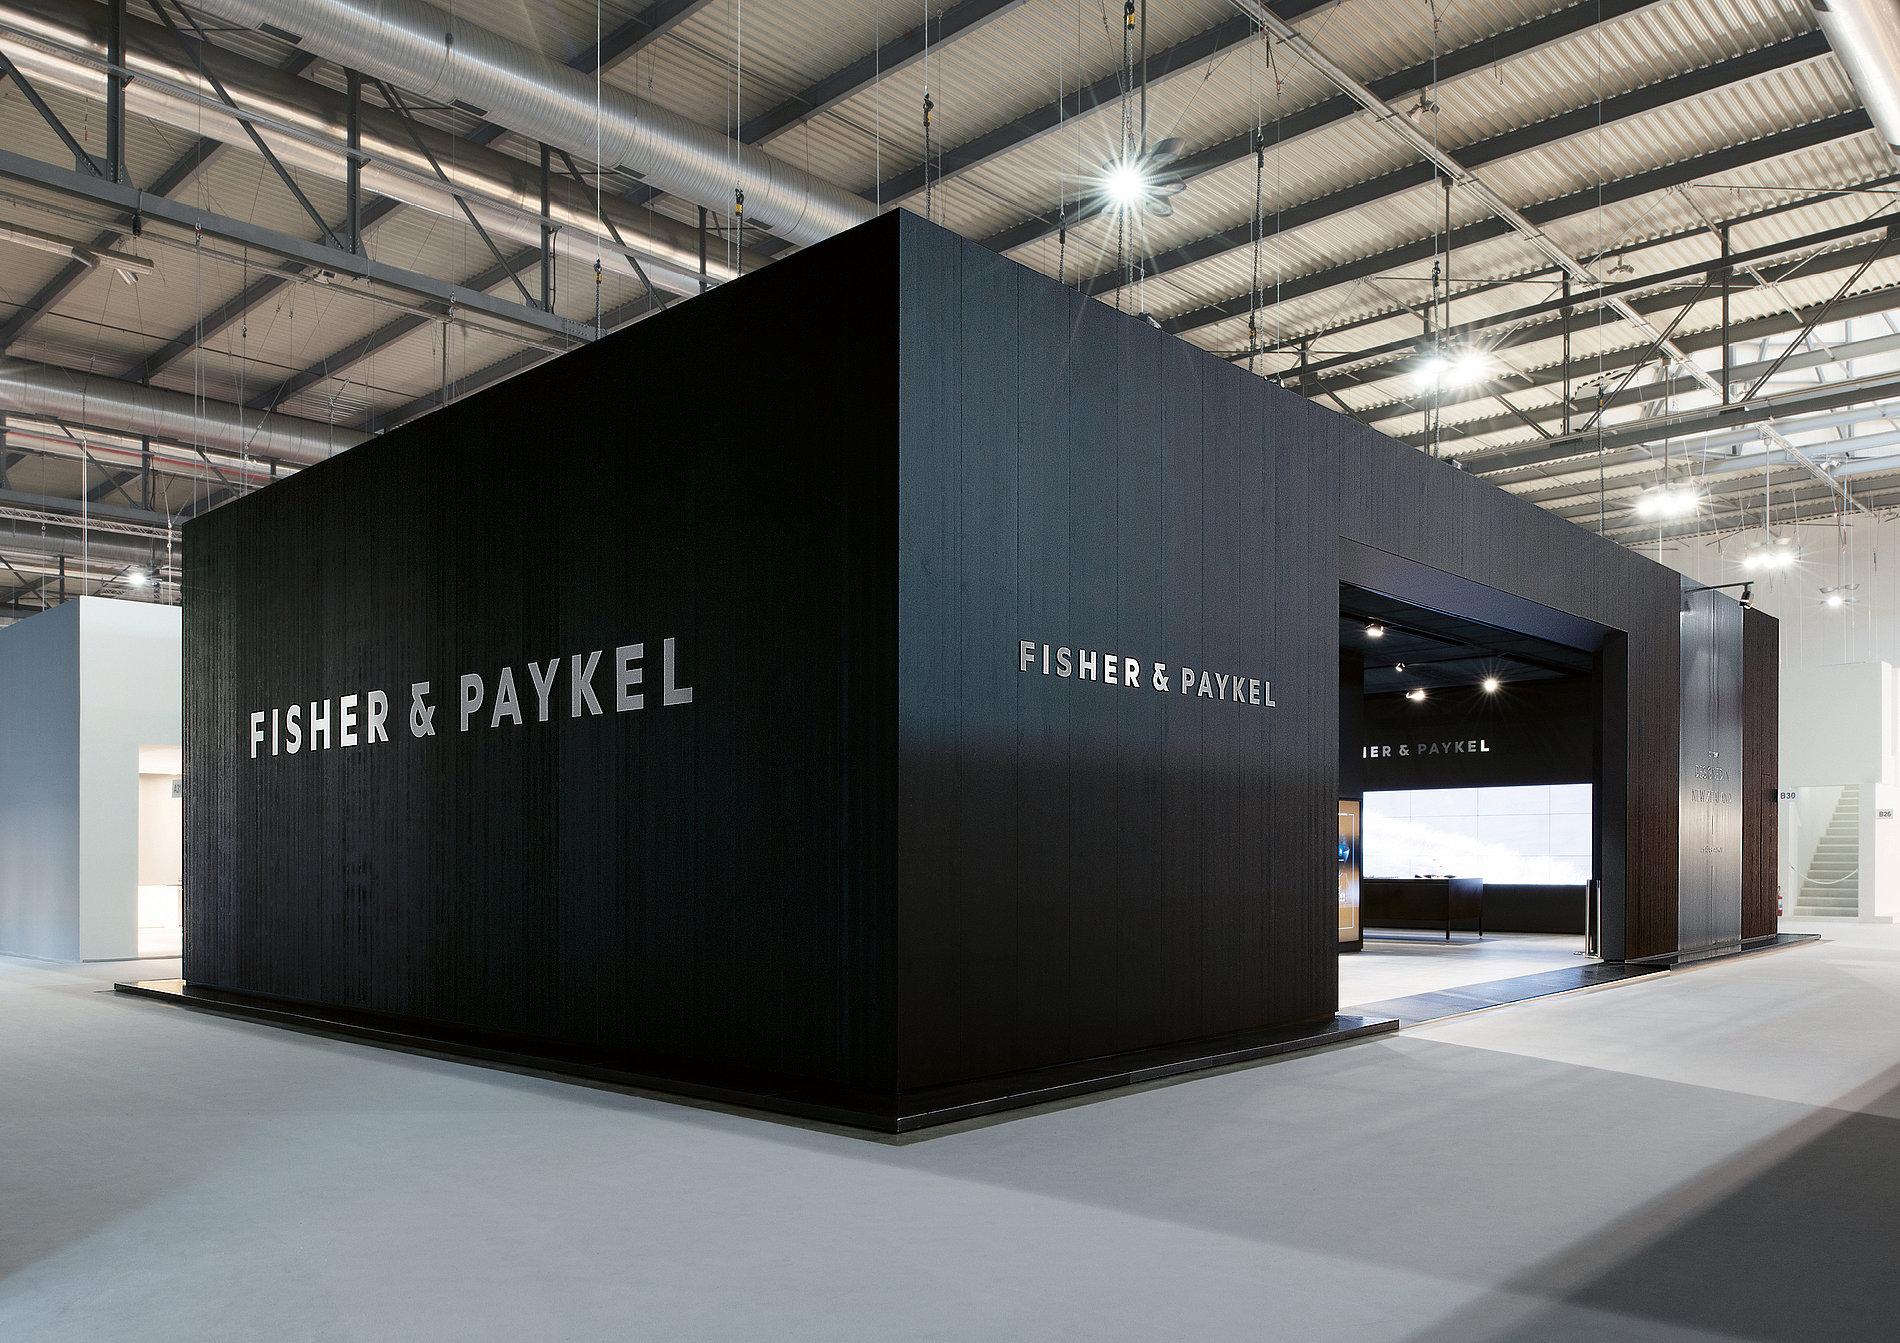 Fisher & Paykel Fair Stand EuroCucina Milan | Red Dot Design Award